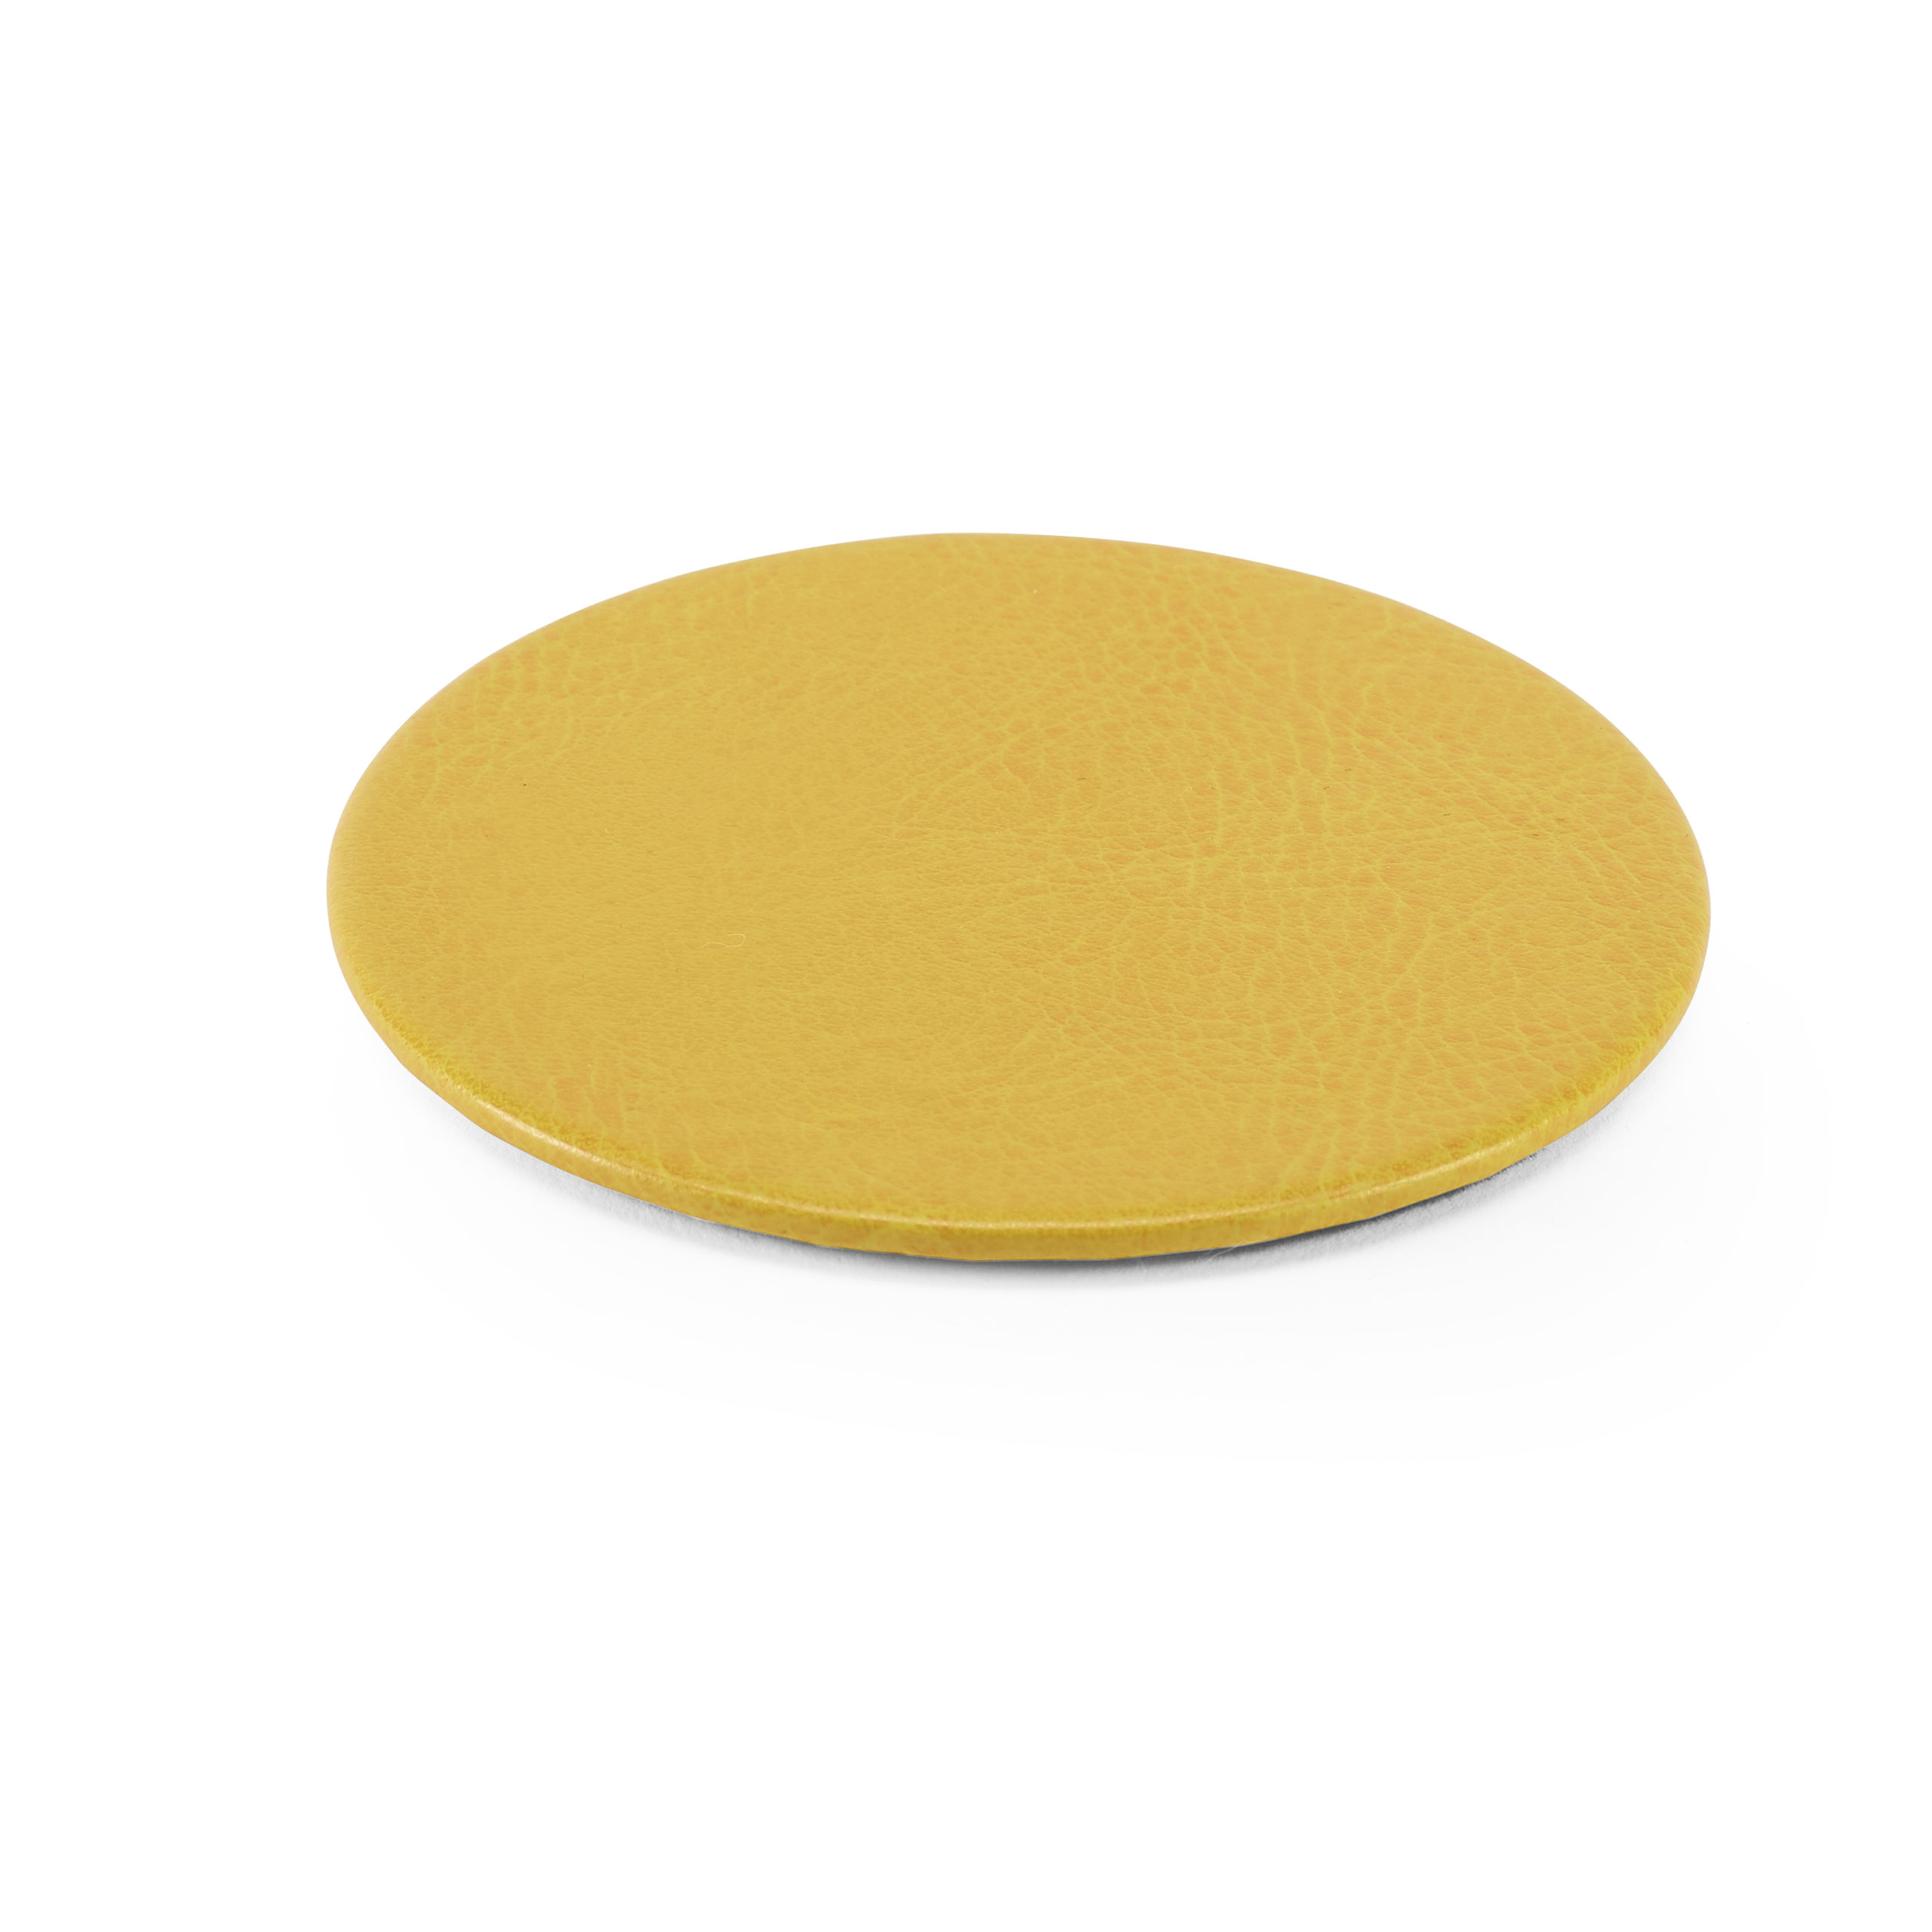 Lifestyle Round Coaster in Yellow